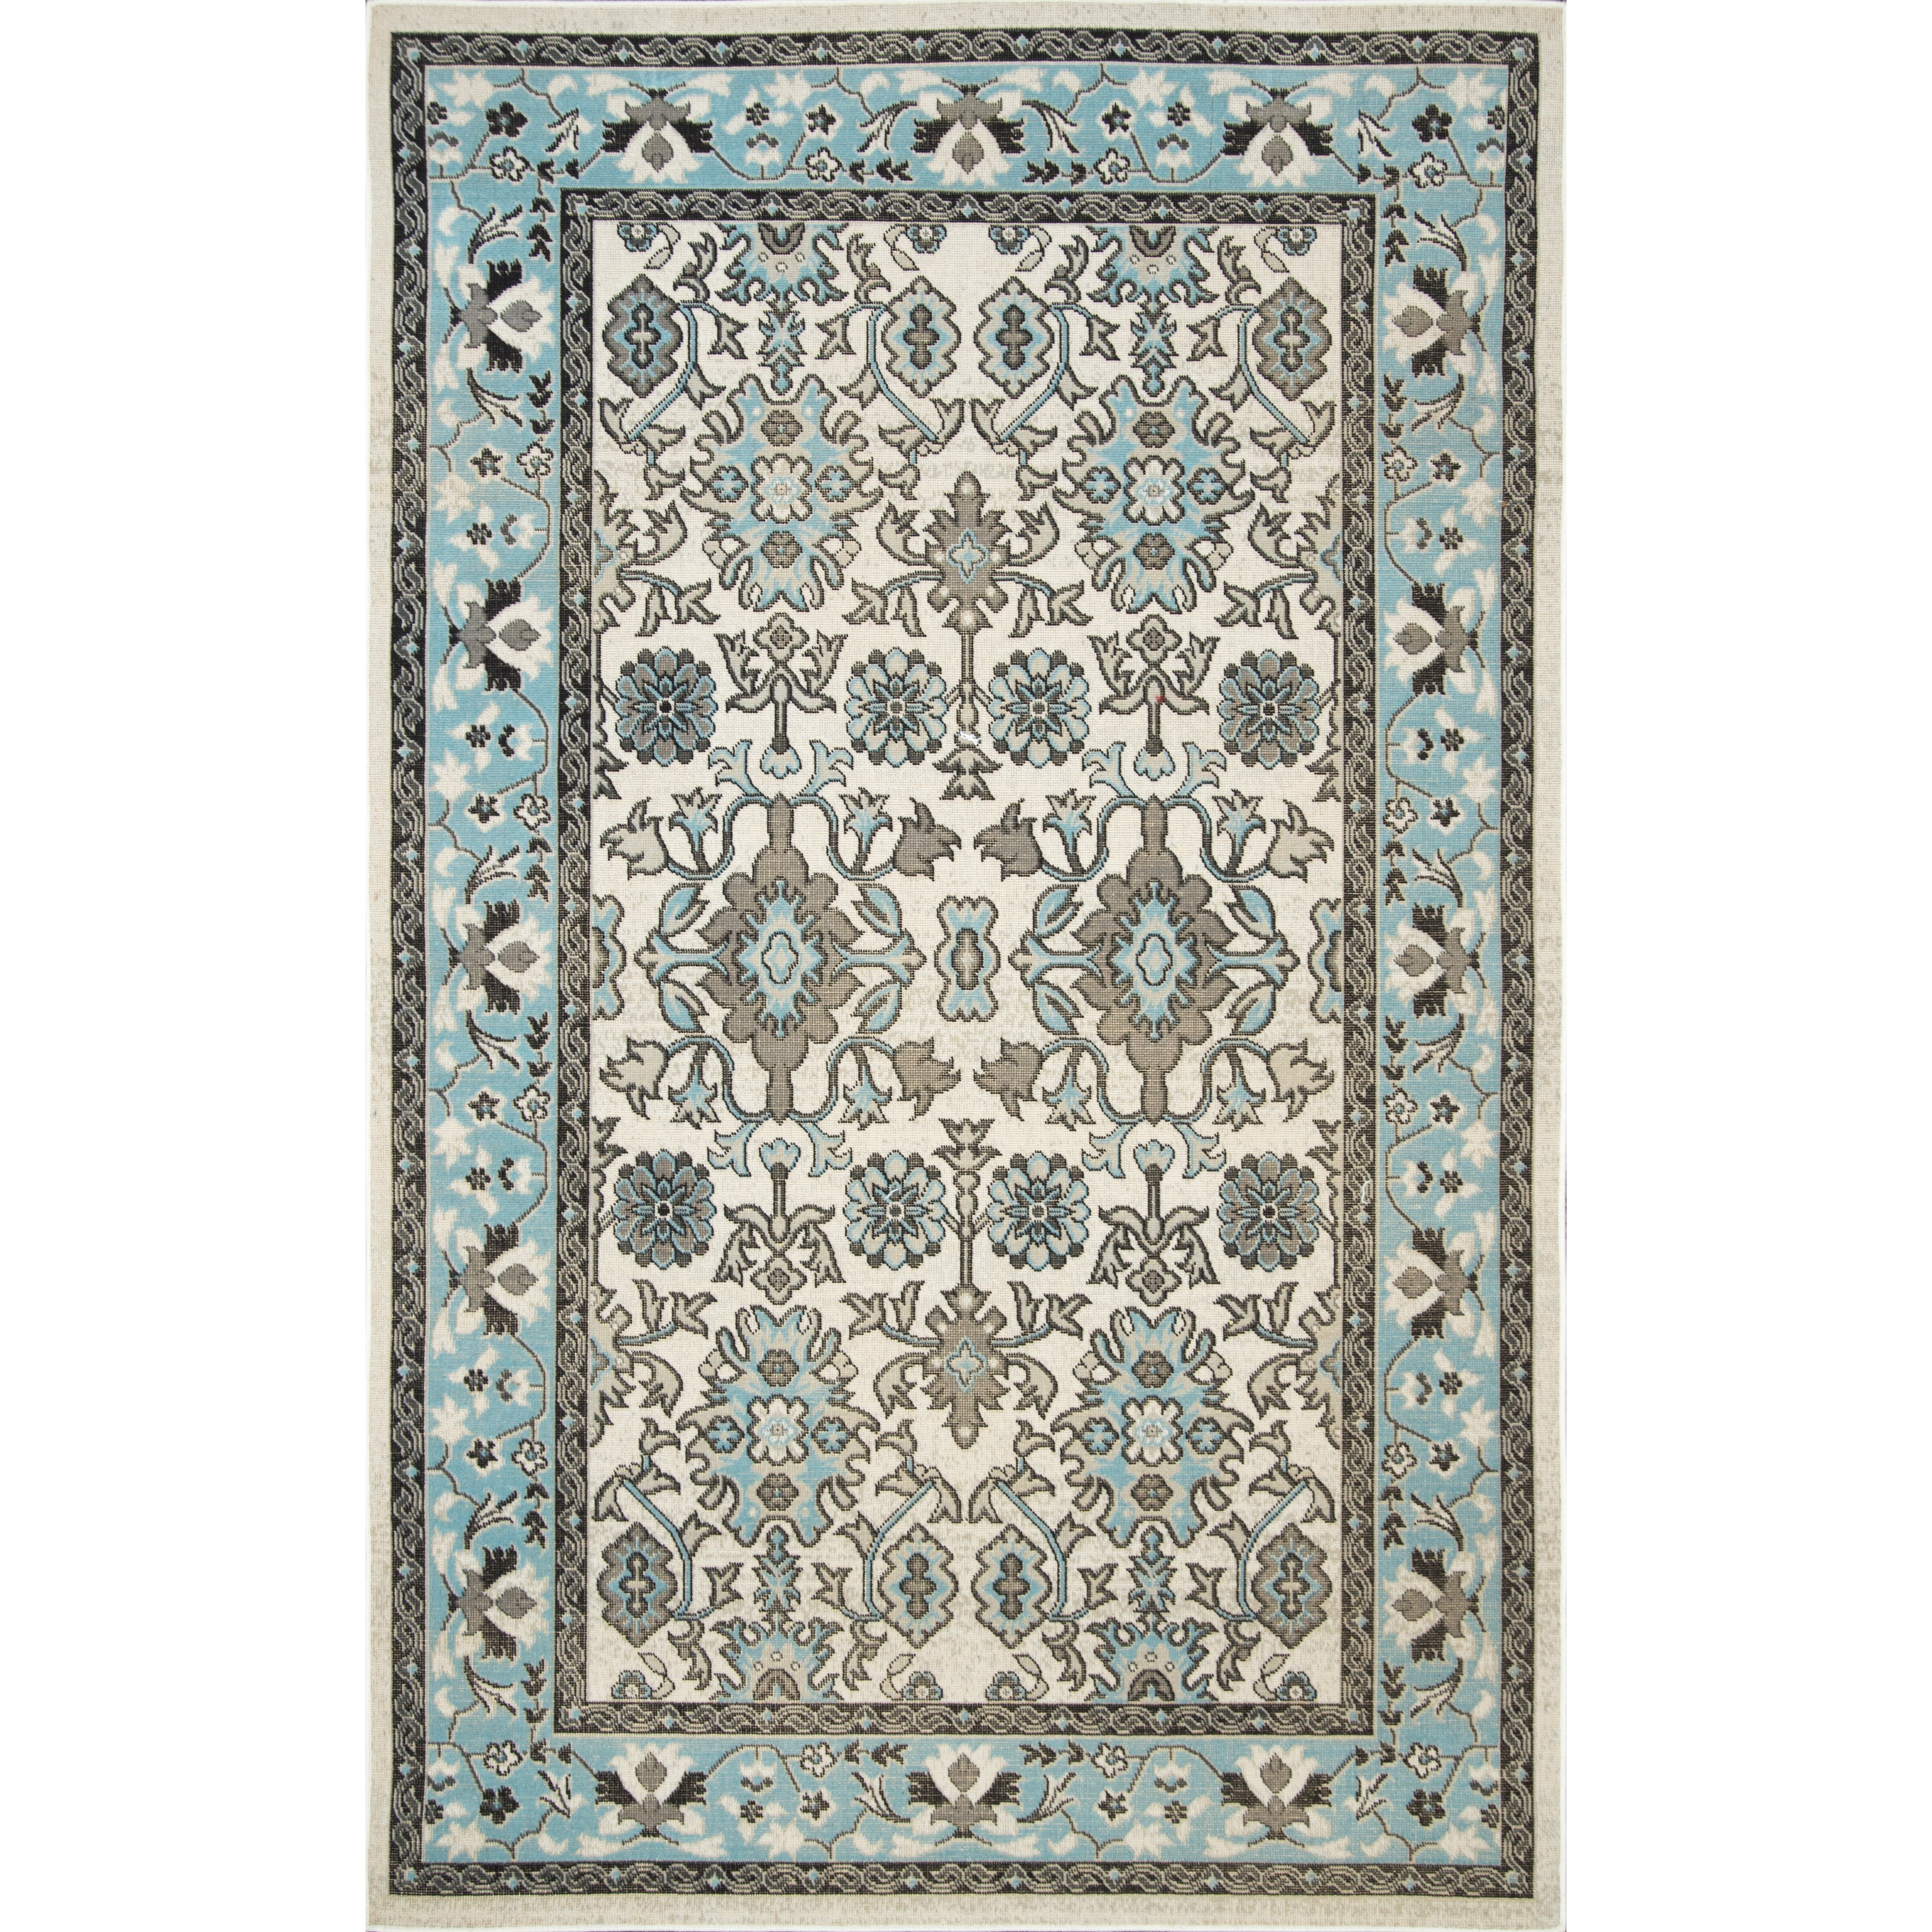 Nuloom pennington light blue indoor outdoor area rug for Blue indoor outdoor rug